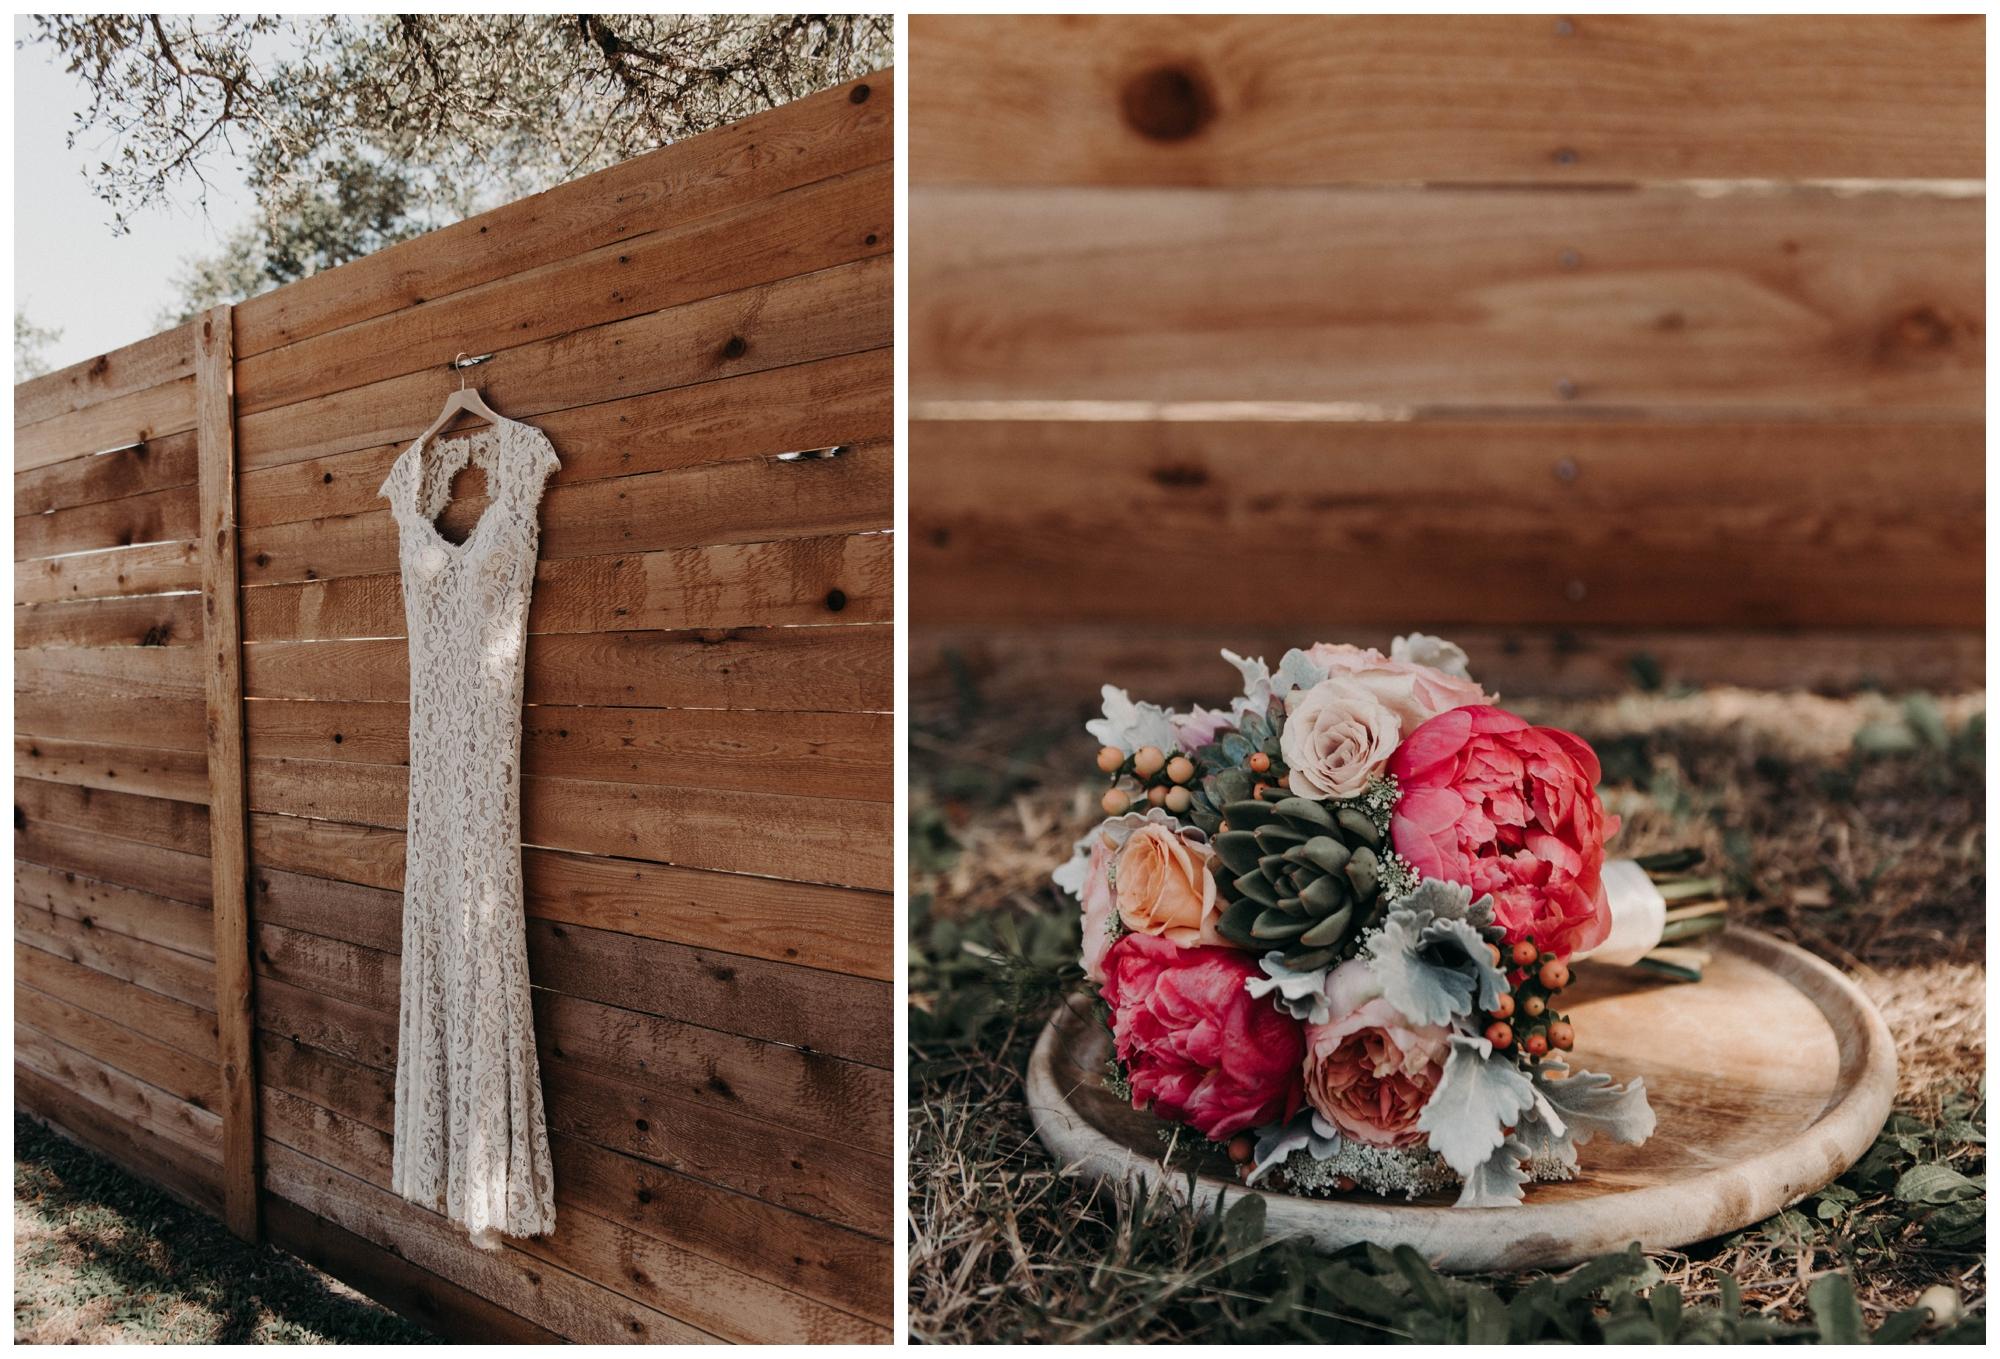 austin-texas-wedding-photography-1778-photographie_0030.jpg